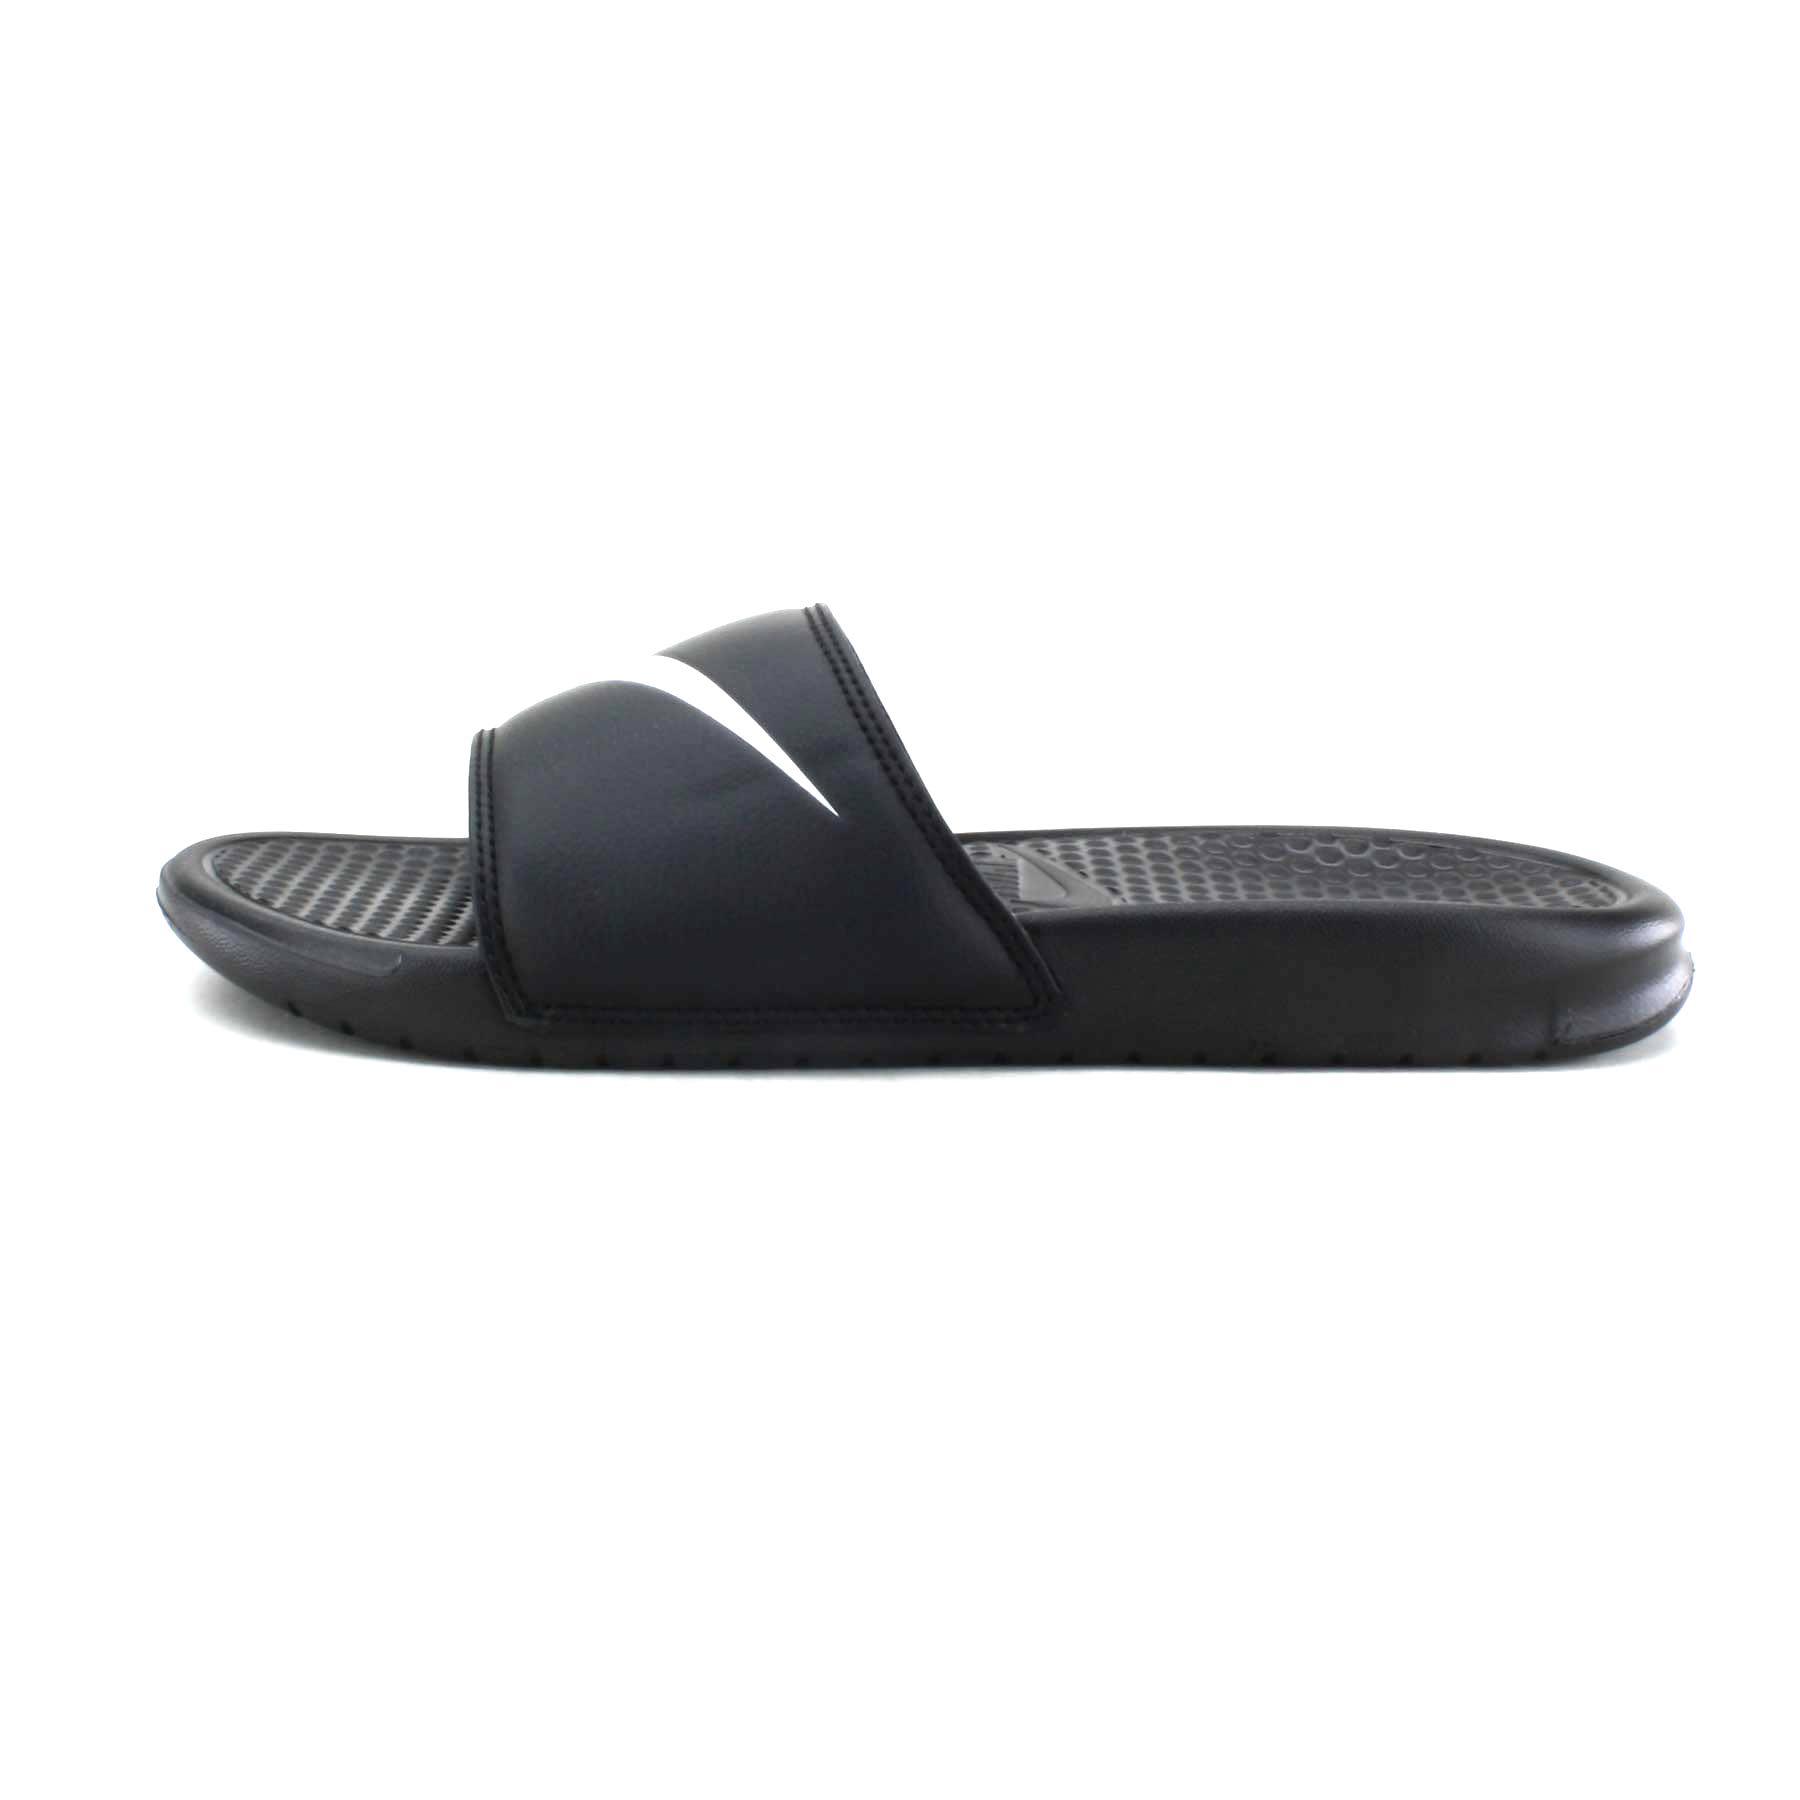 Nike Negro Us 011 12 Benassi Blanco Envío Sz Gratis 312618 Swoosh rxUrPYI